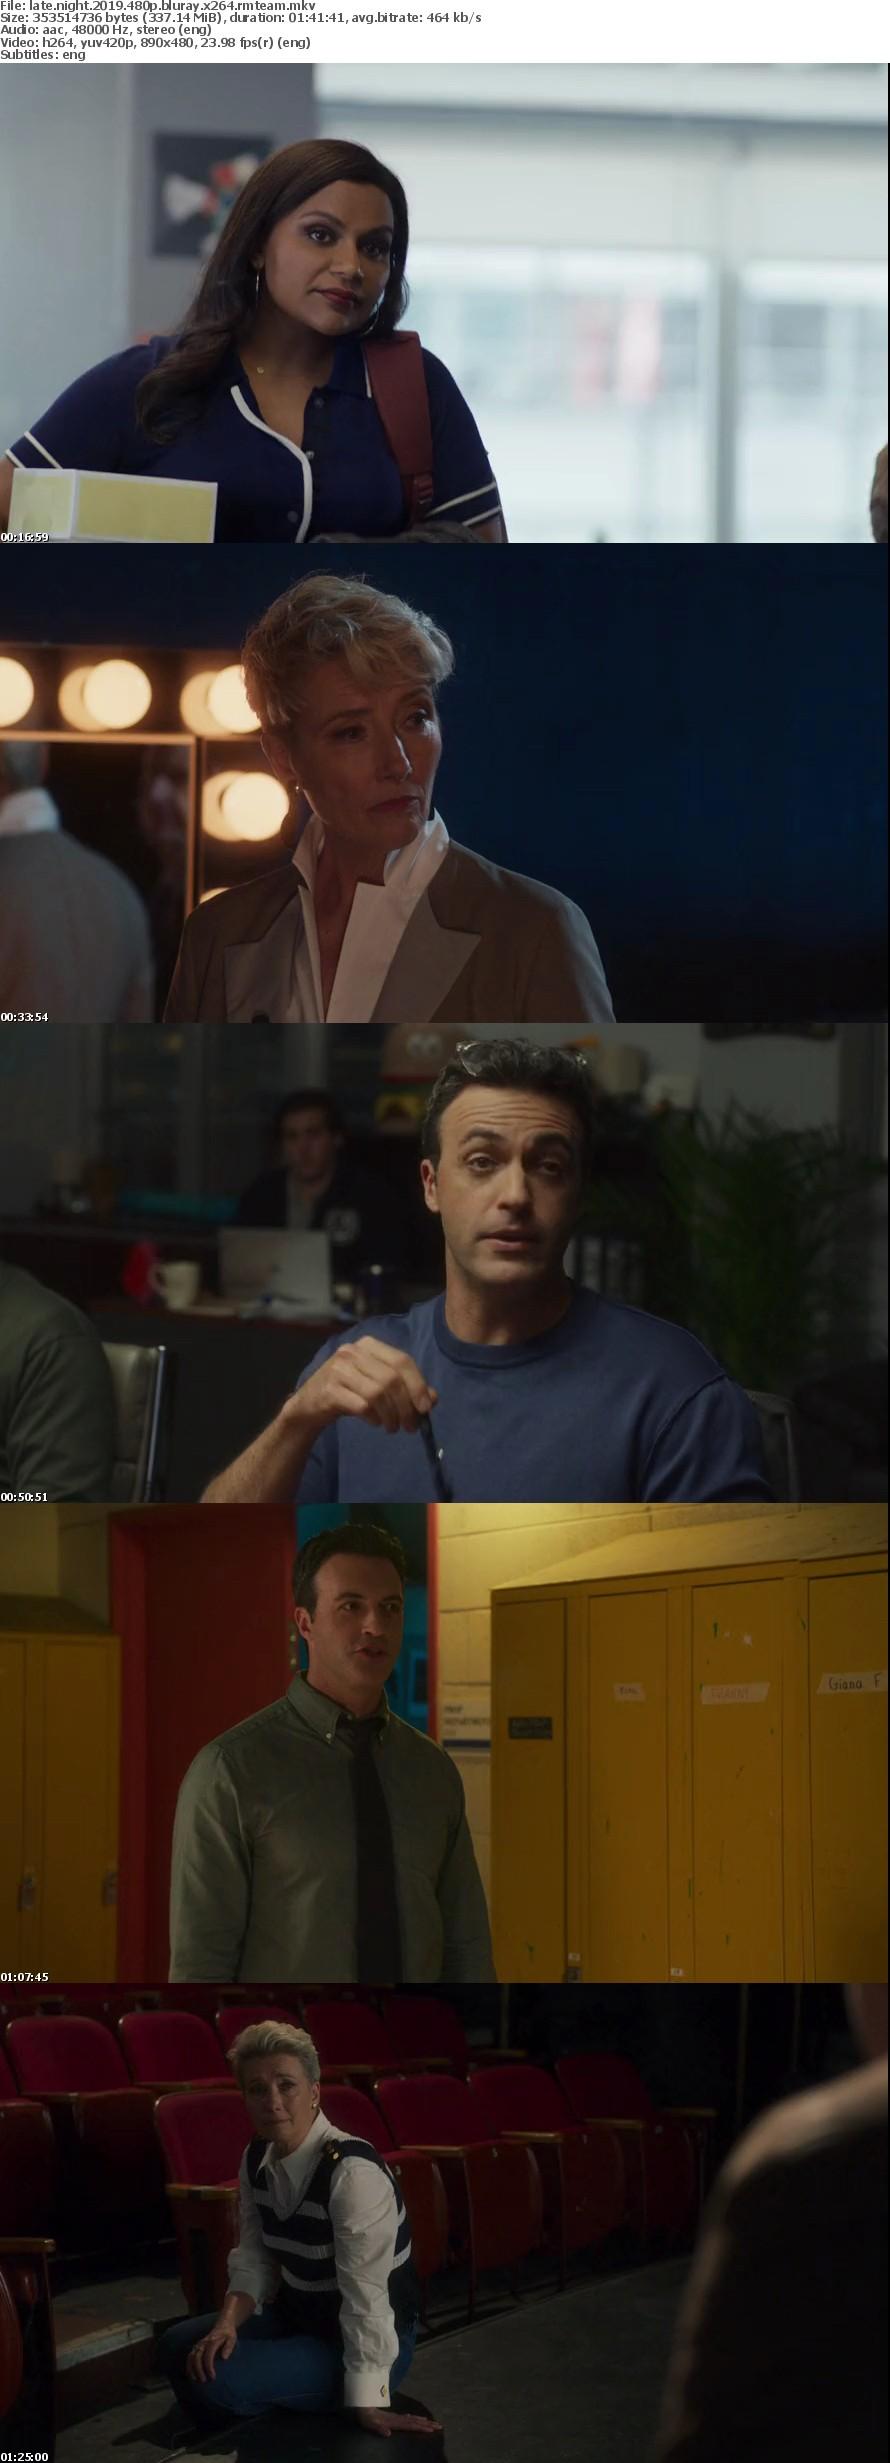 Late Night 2019 480p BluRay X264-RMTeam